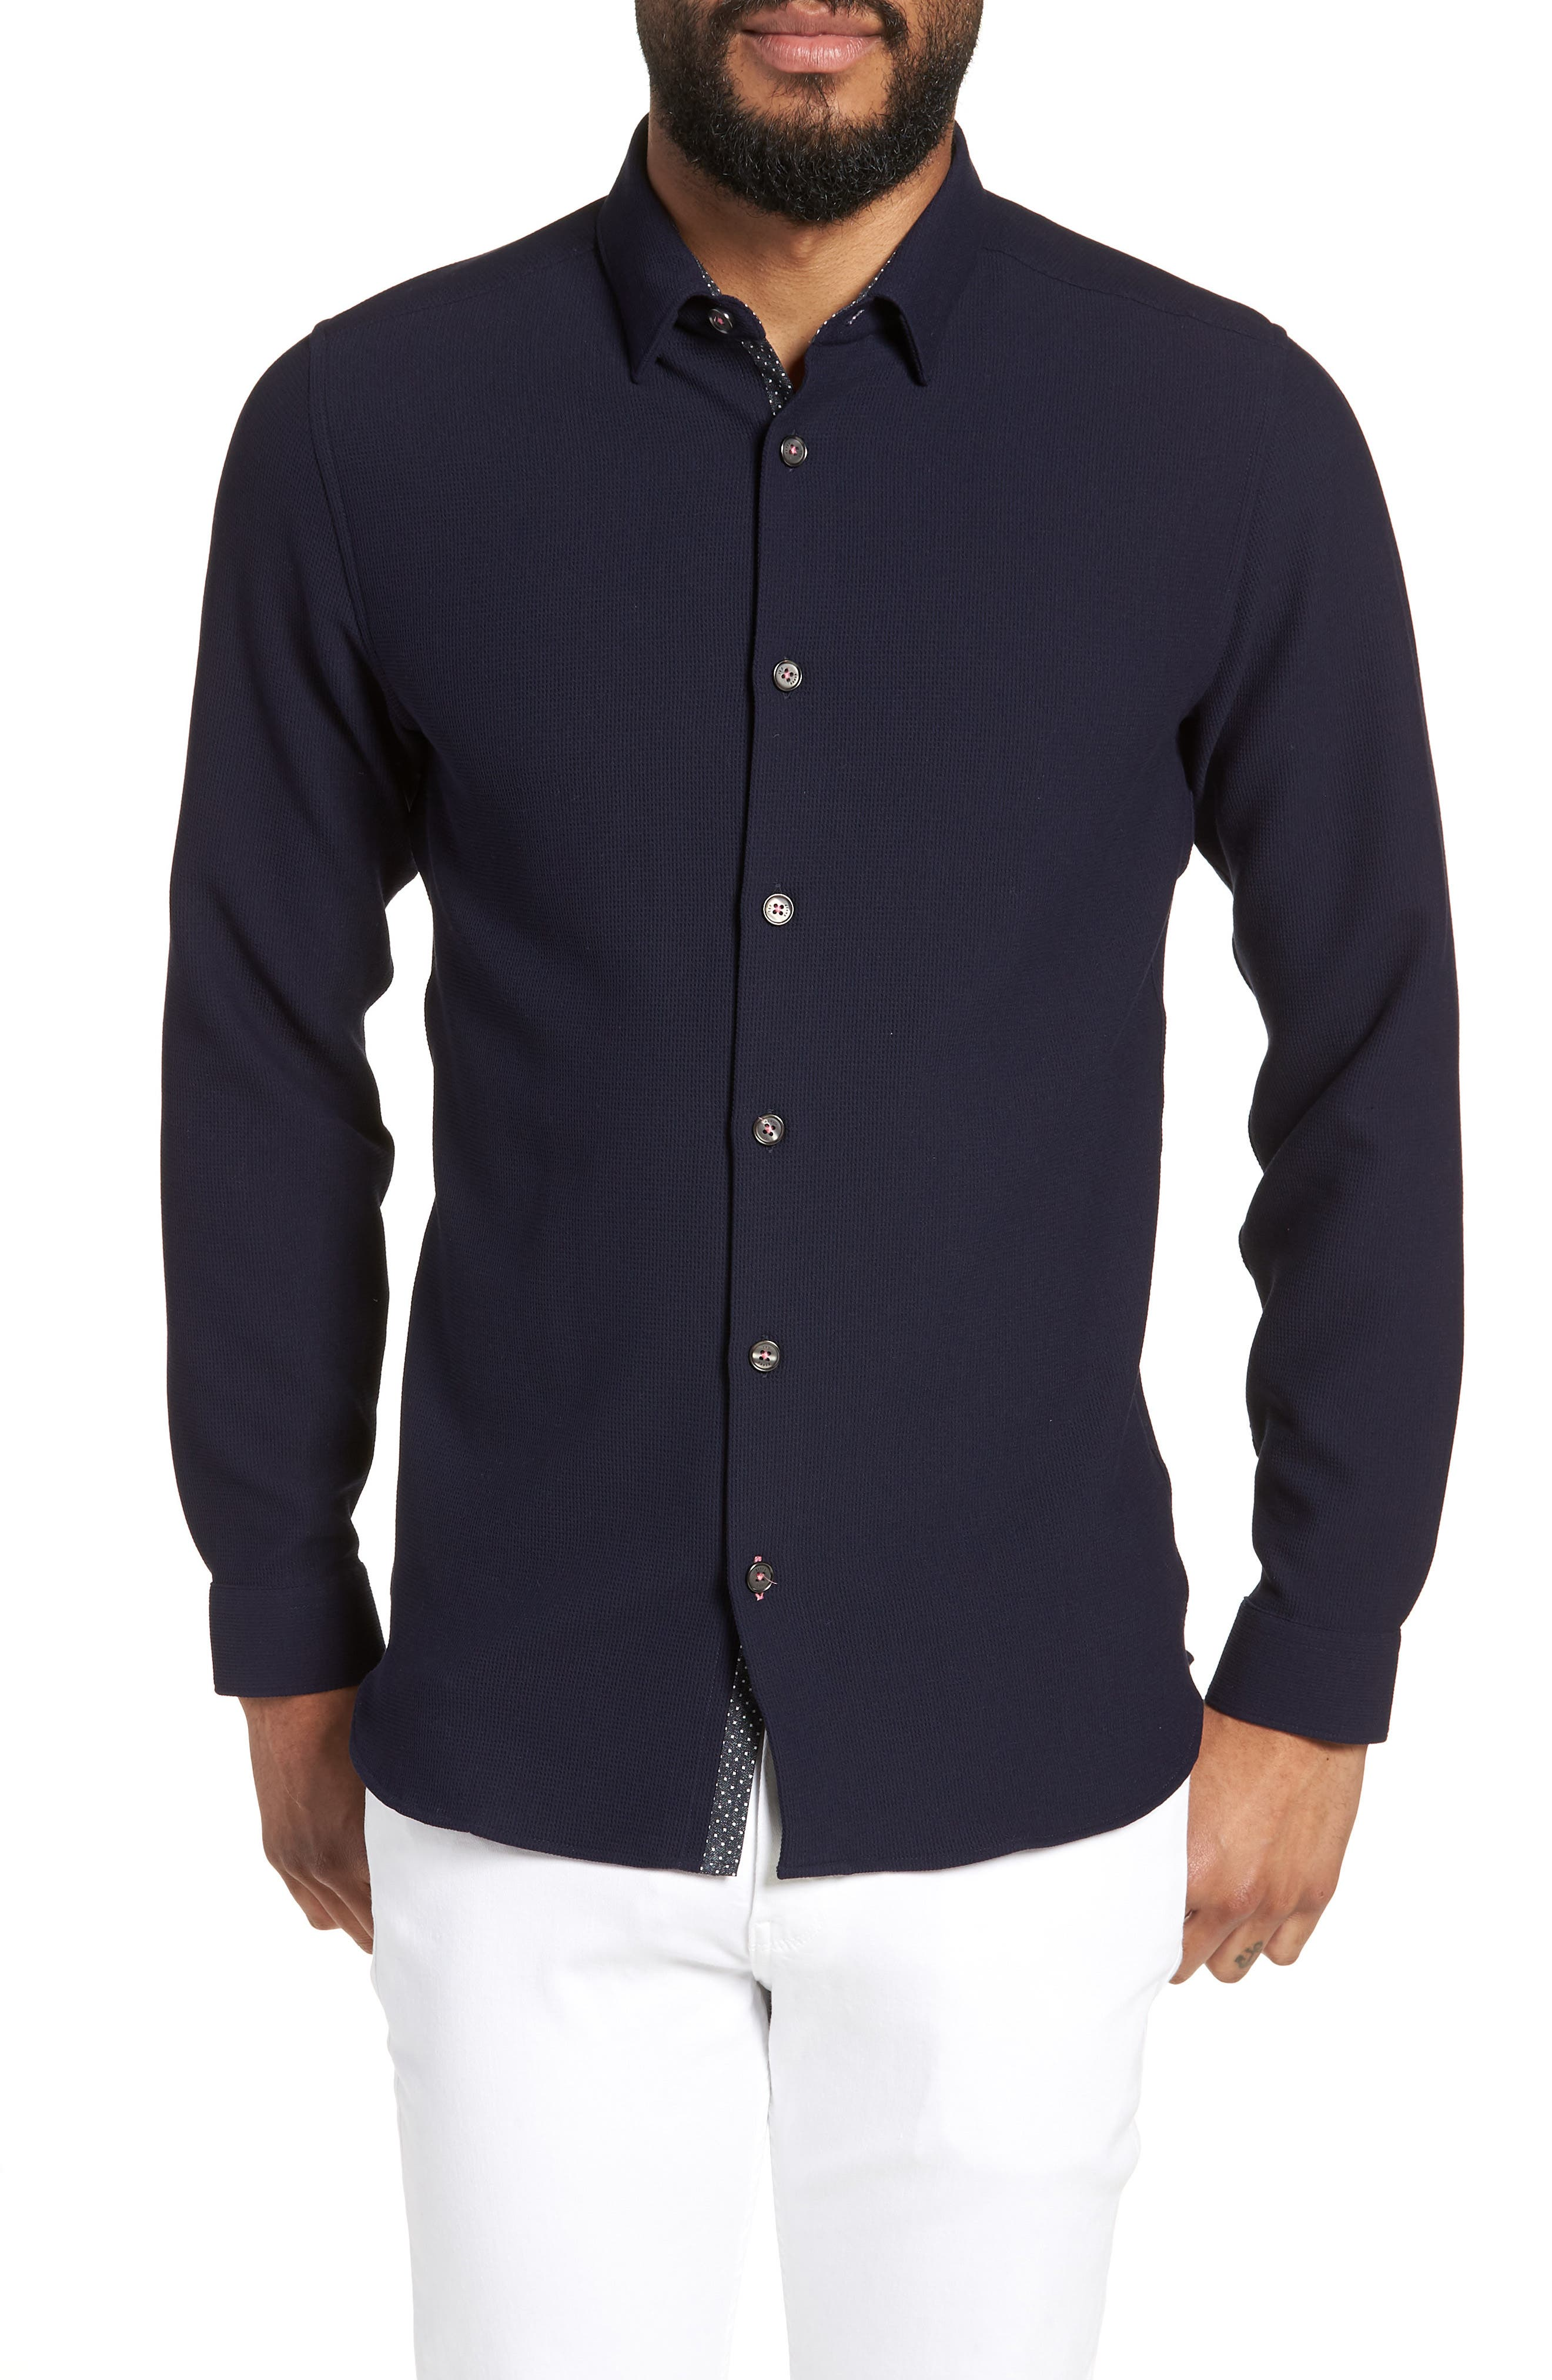 Loretax Trim Fit Stretch Knit Sport Shirt,                         Main,                         color, Navy